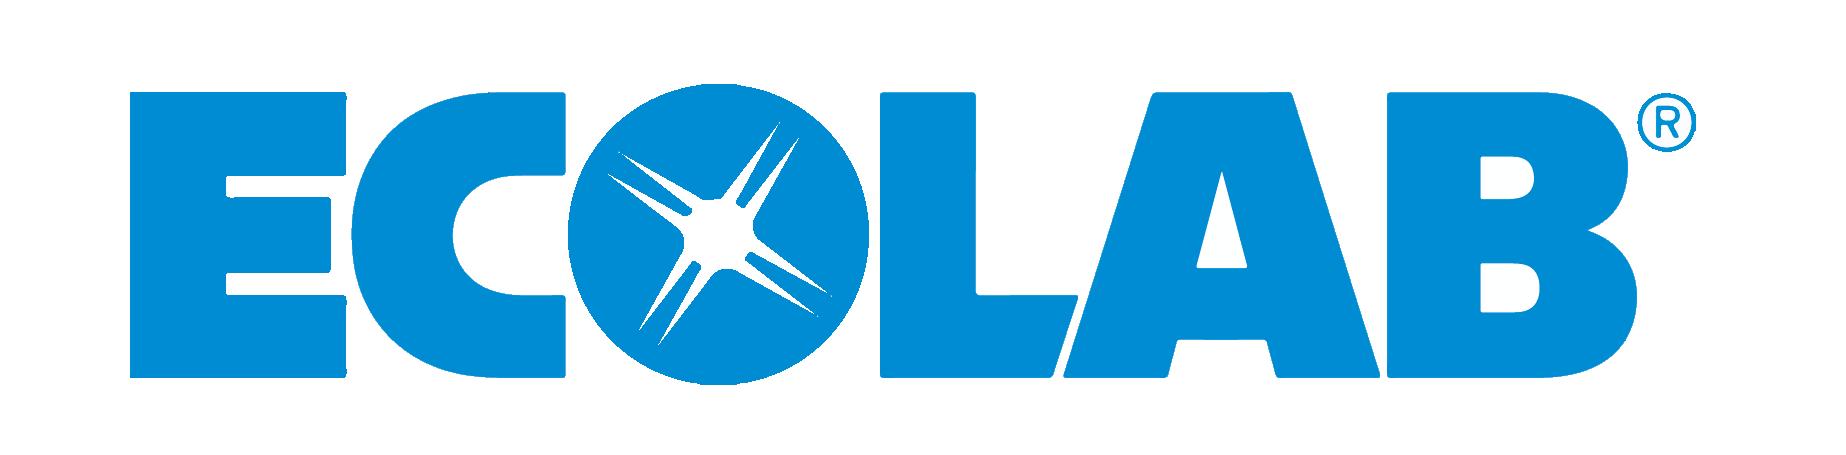 Ecolab_Logo